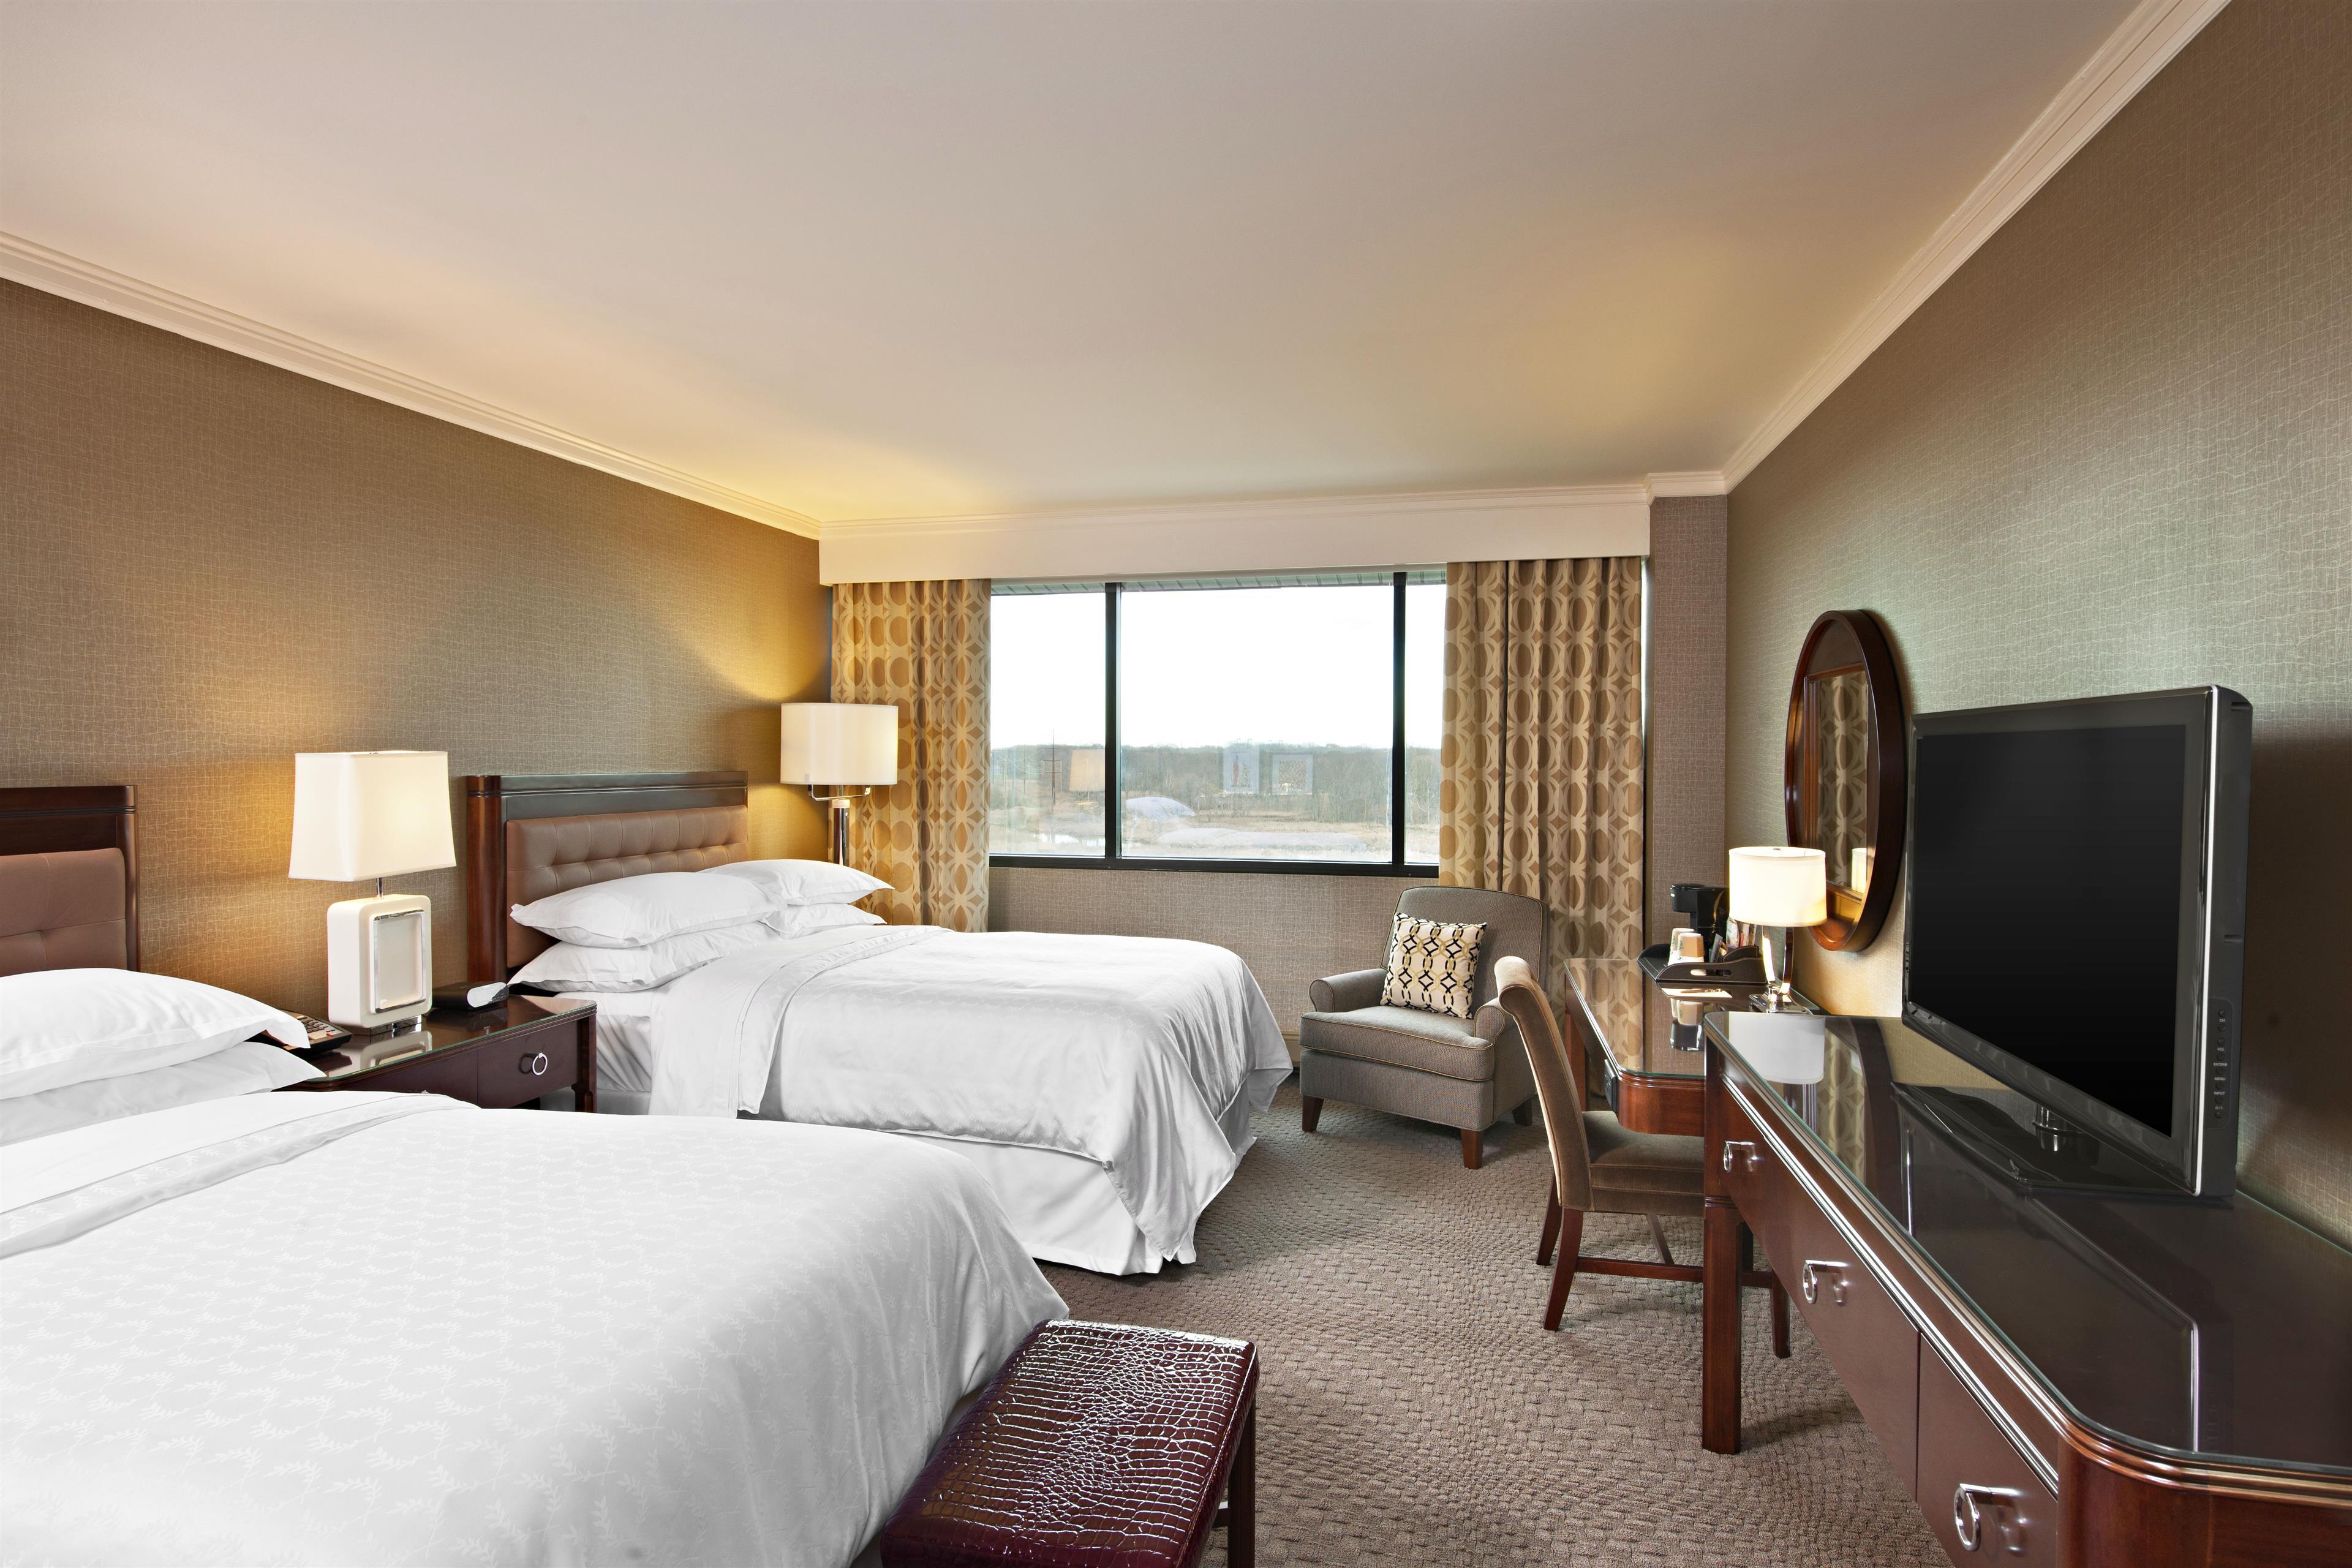 Sheraton Wilmington South Hotel image 10